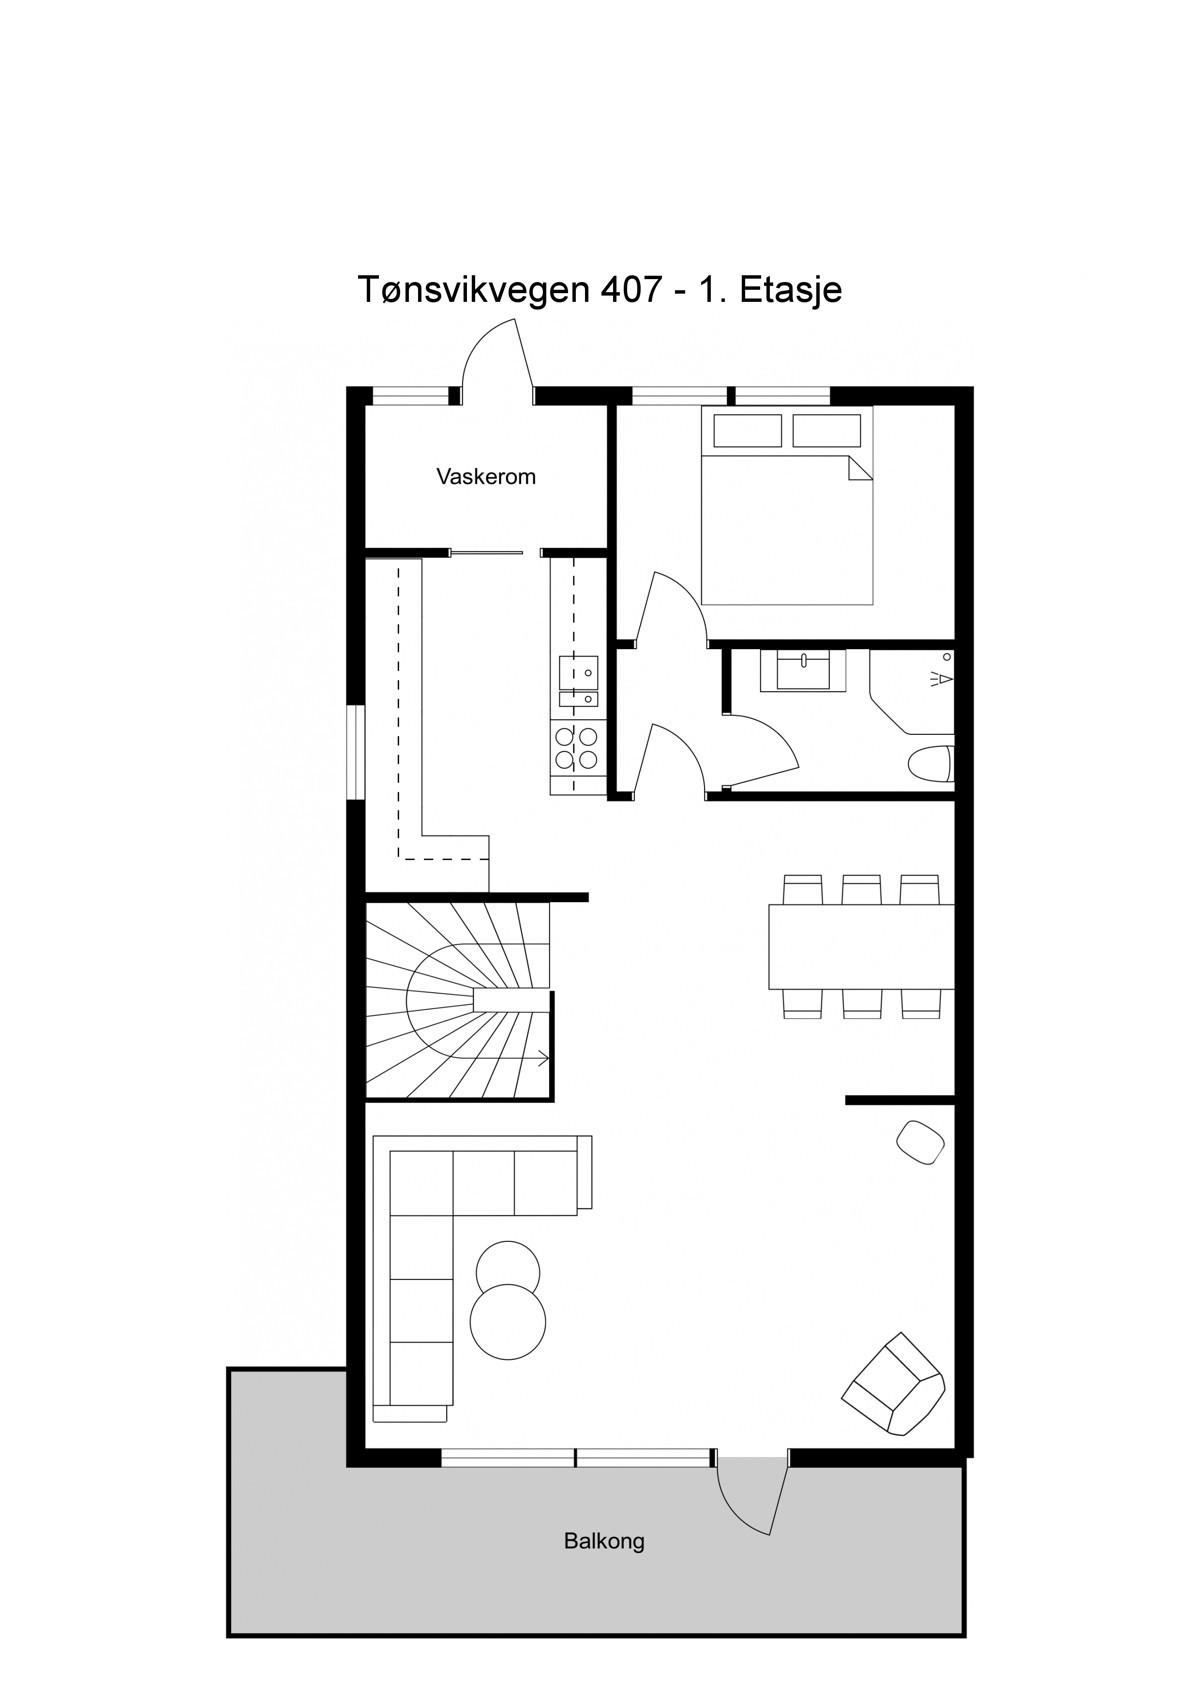 Planskisse 2. plan